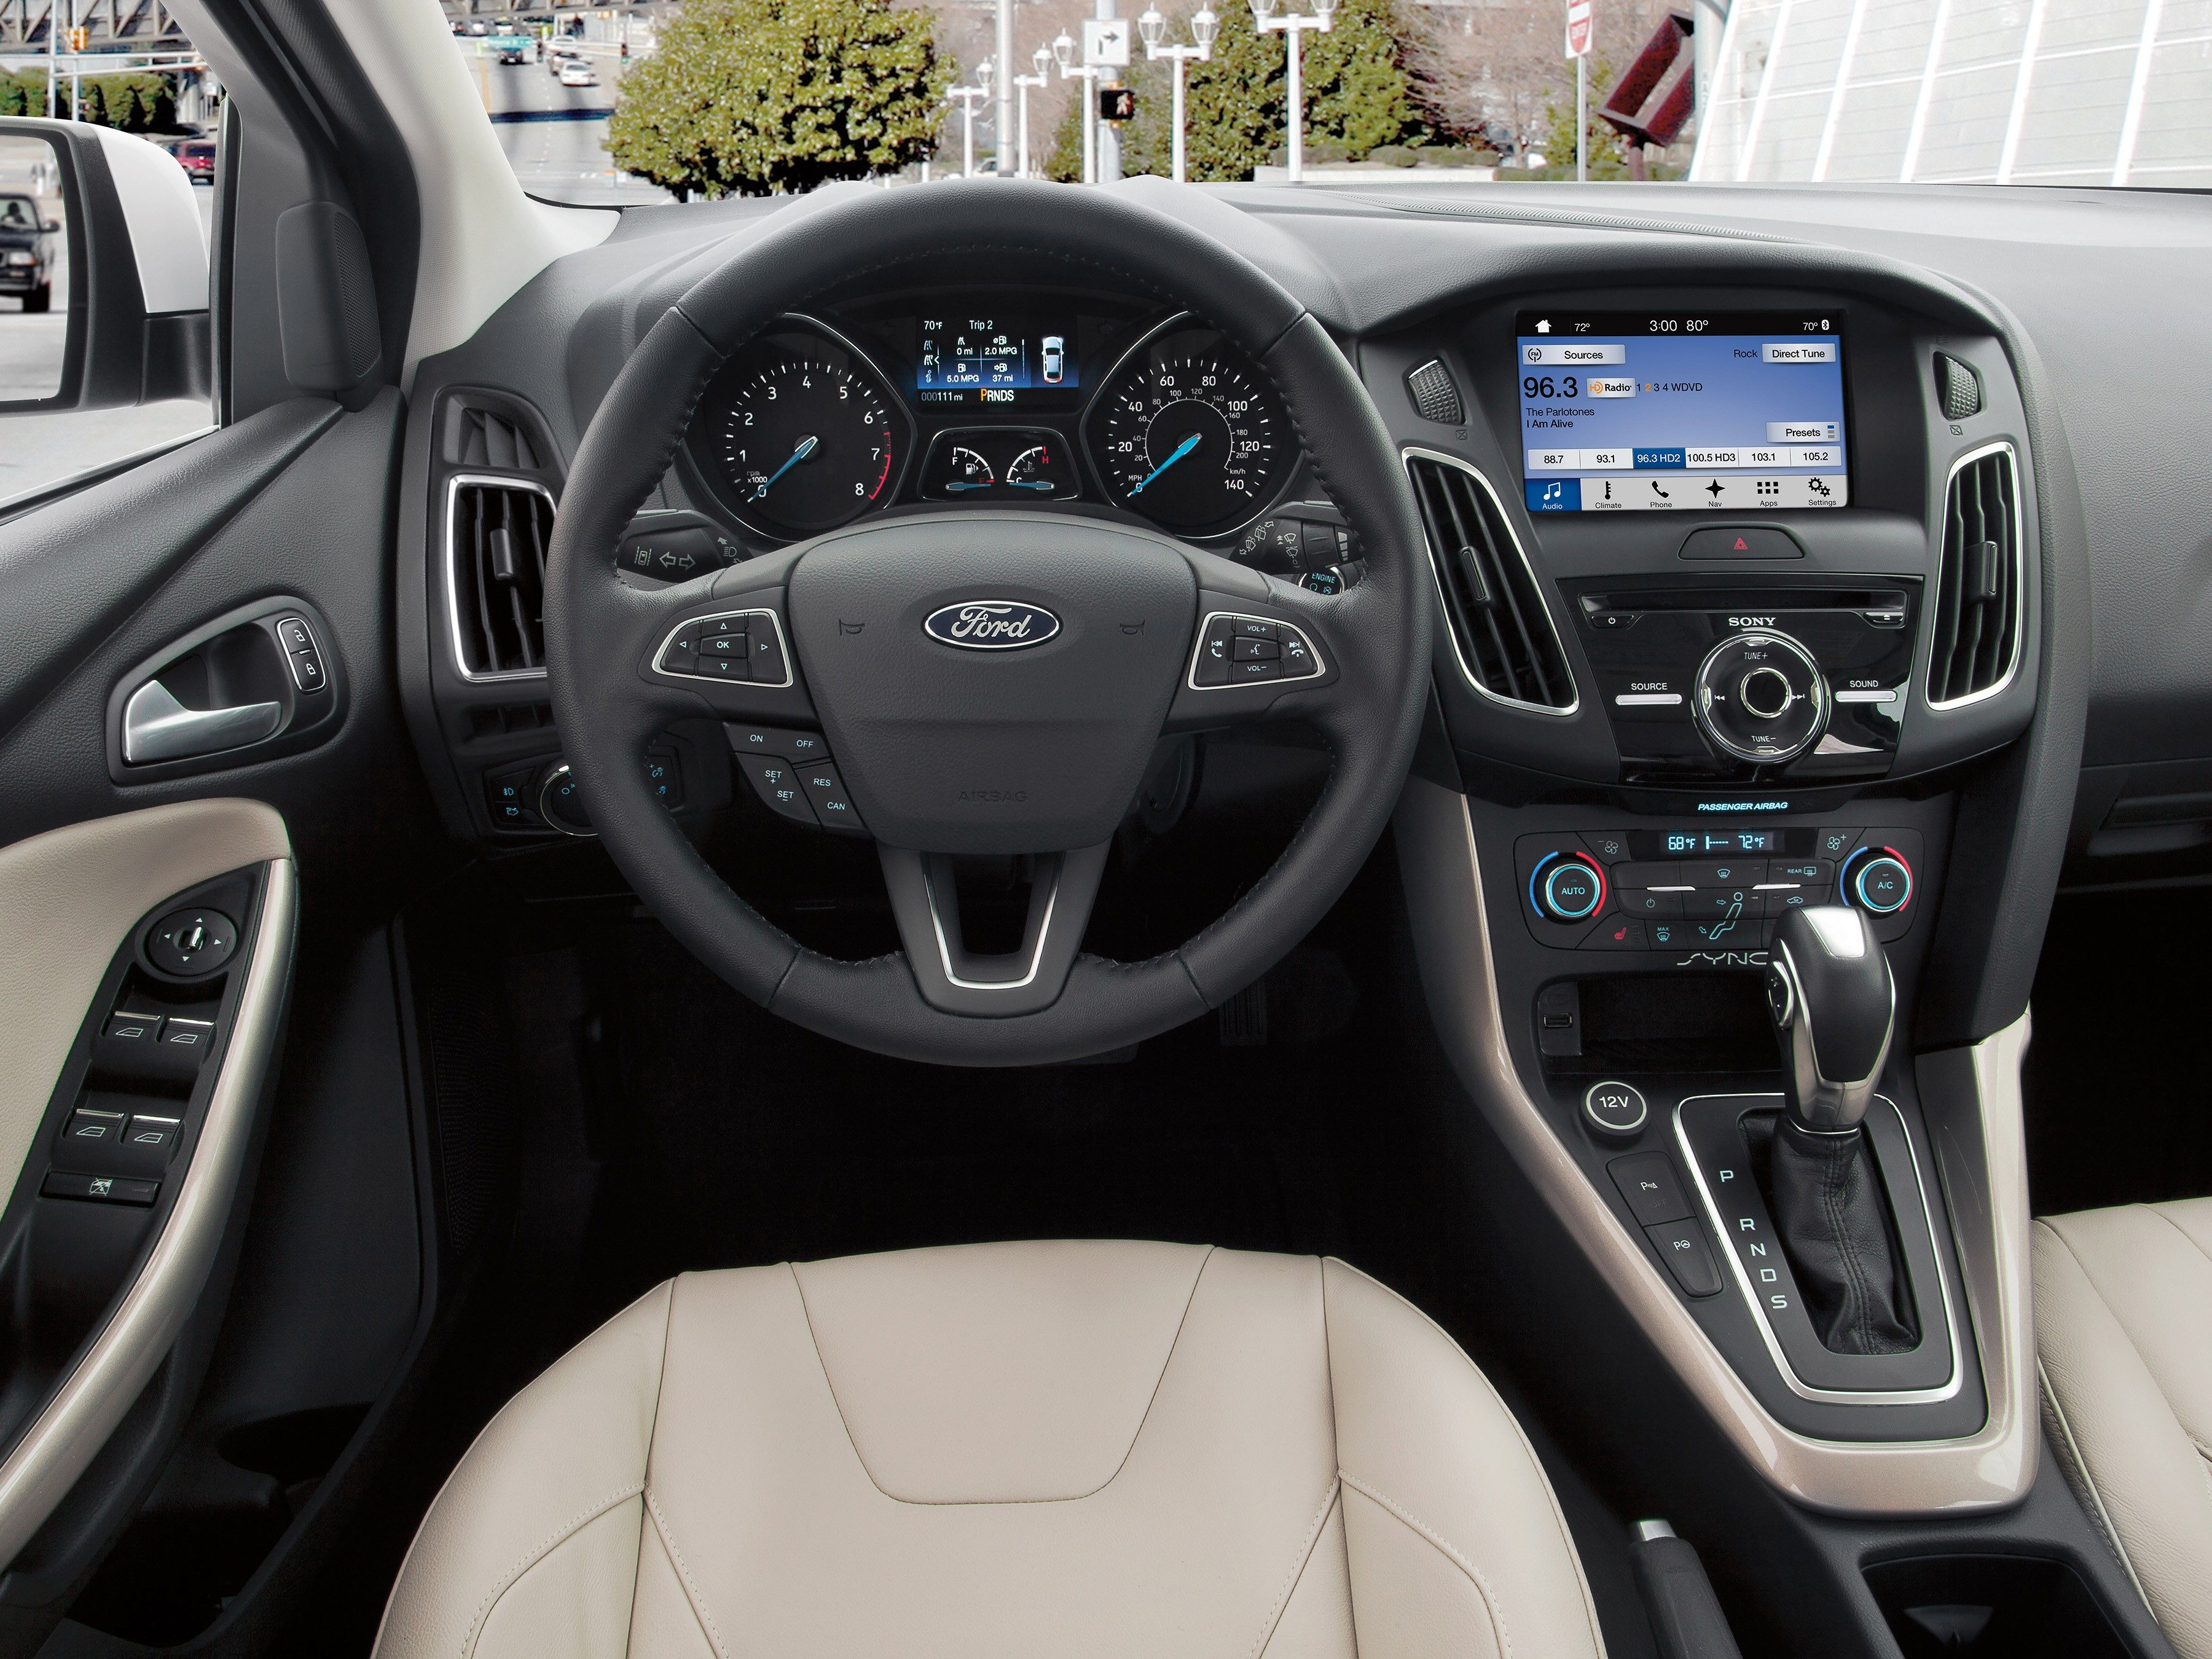 New Automotive Trend #2: Time-Saving Strategies